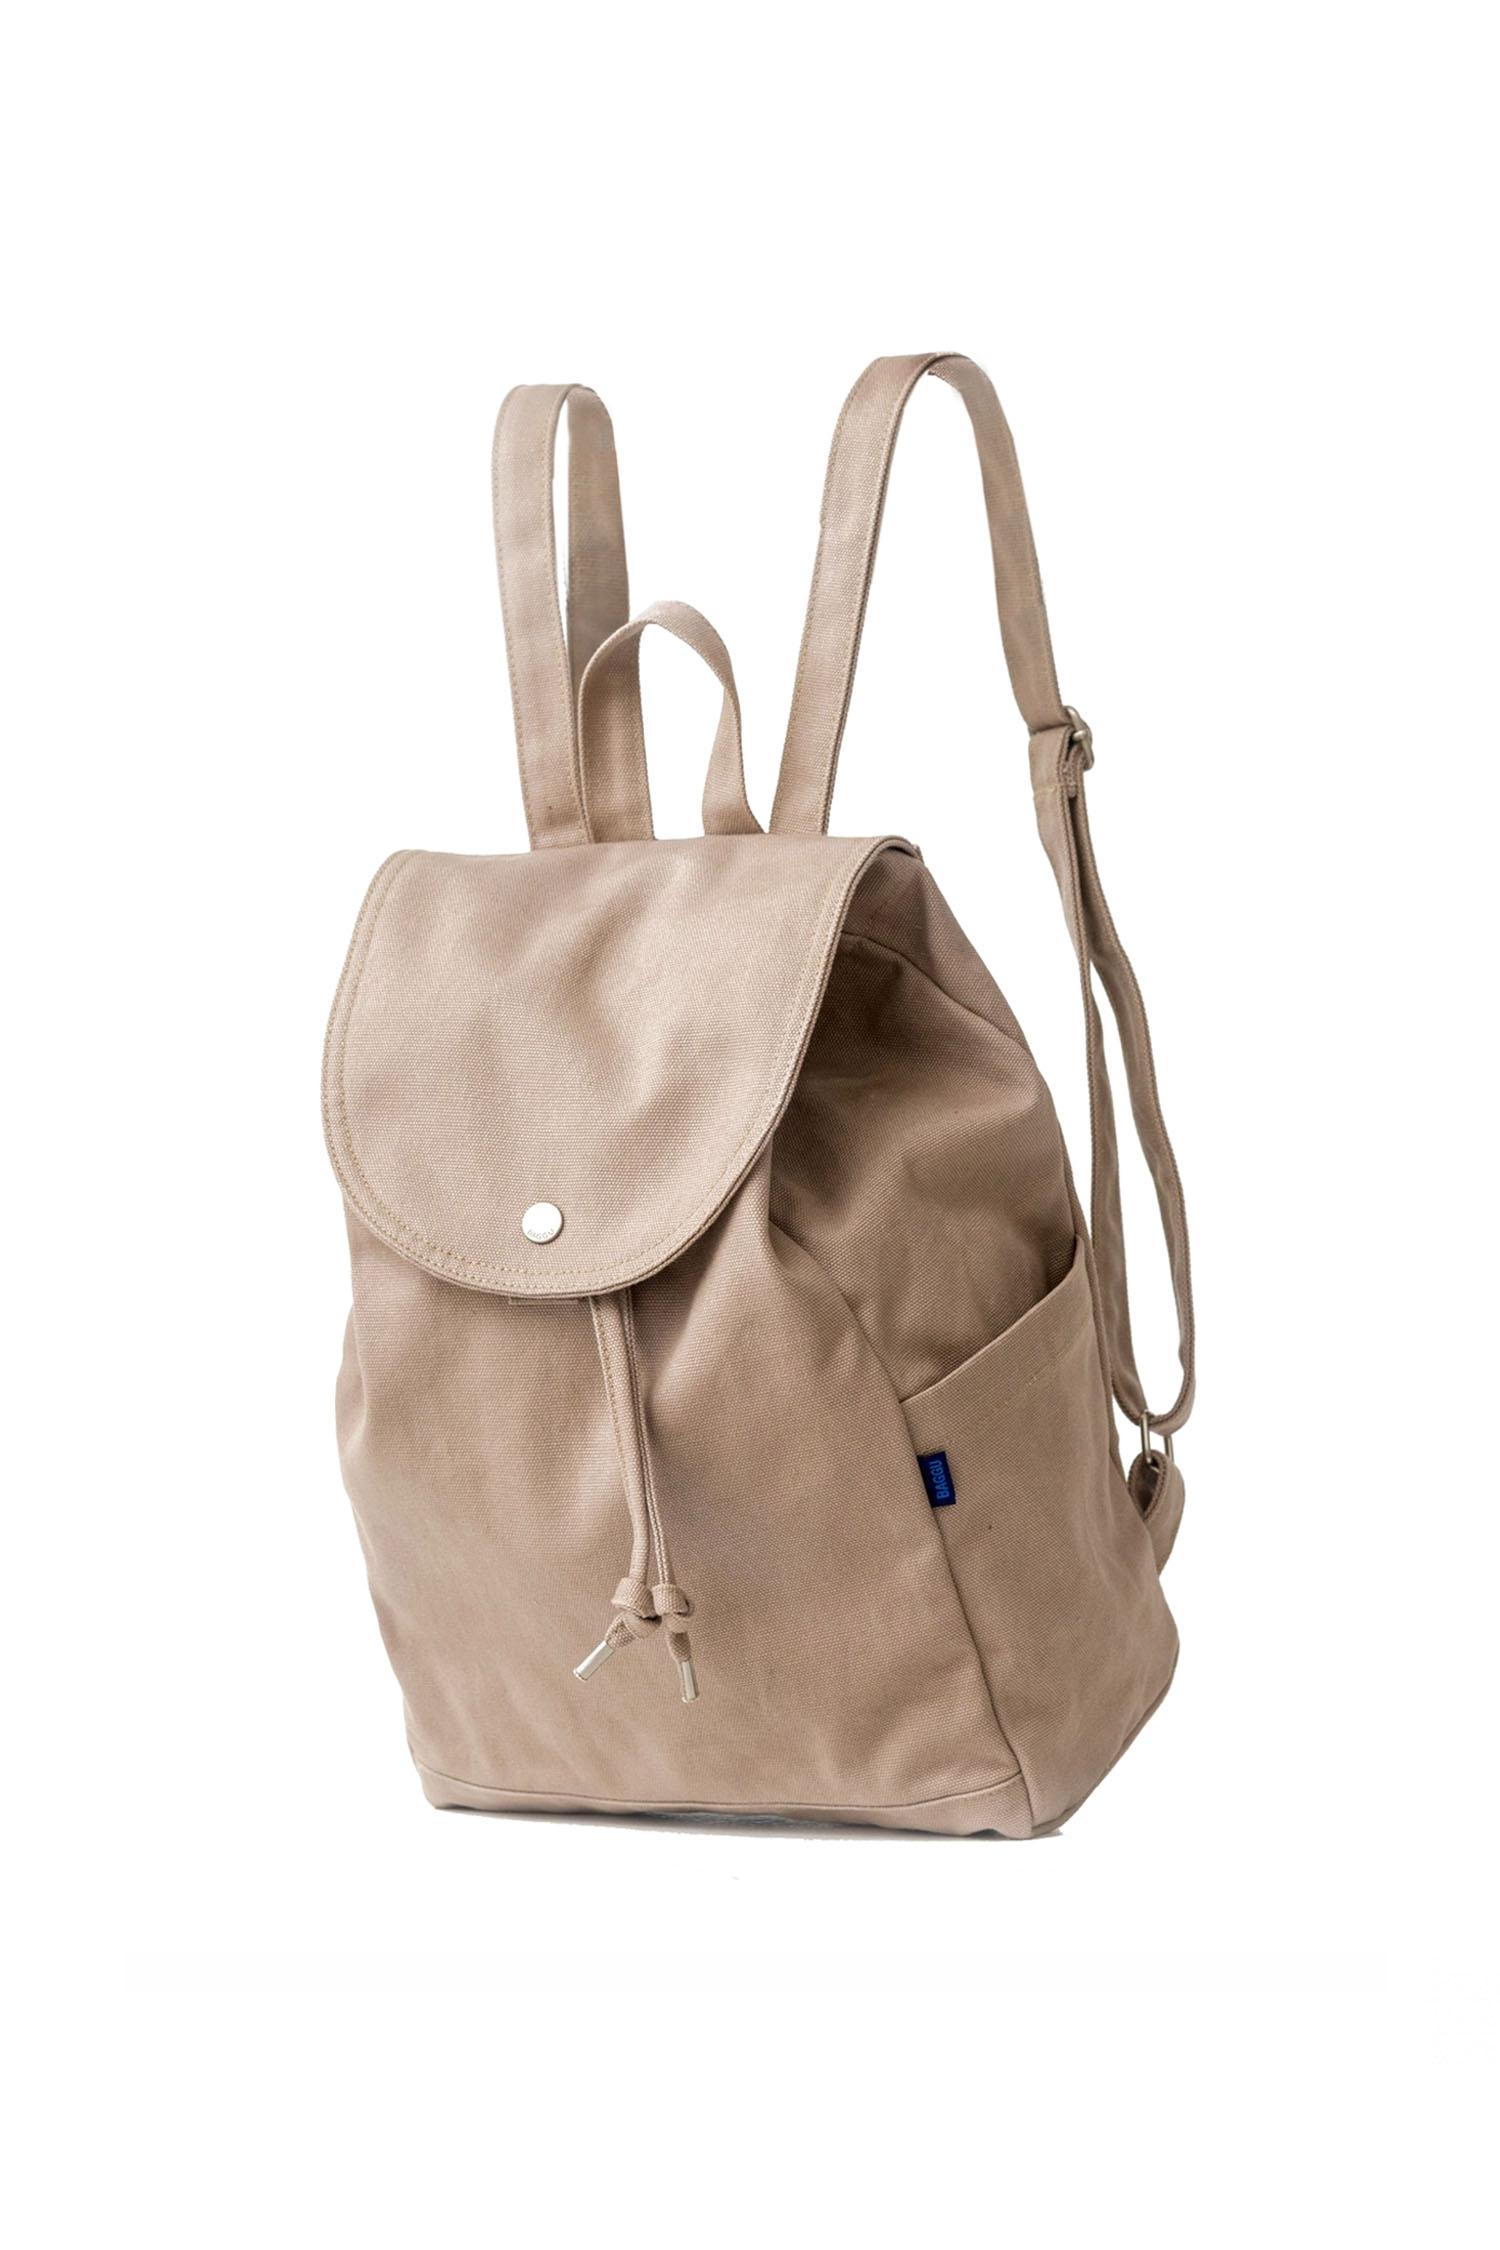 176e905c9 Baggu - Drawstring Backpack, Mushroom, Marinsel Webshop